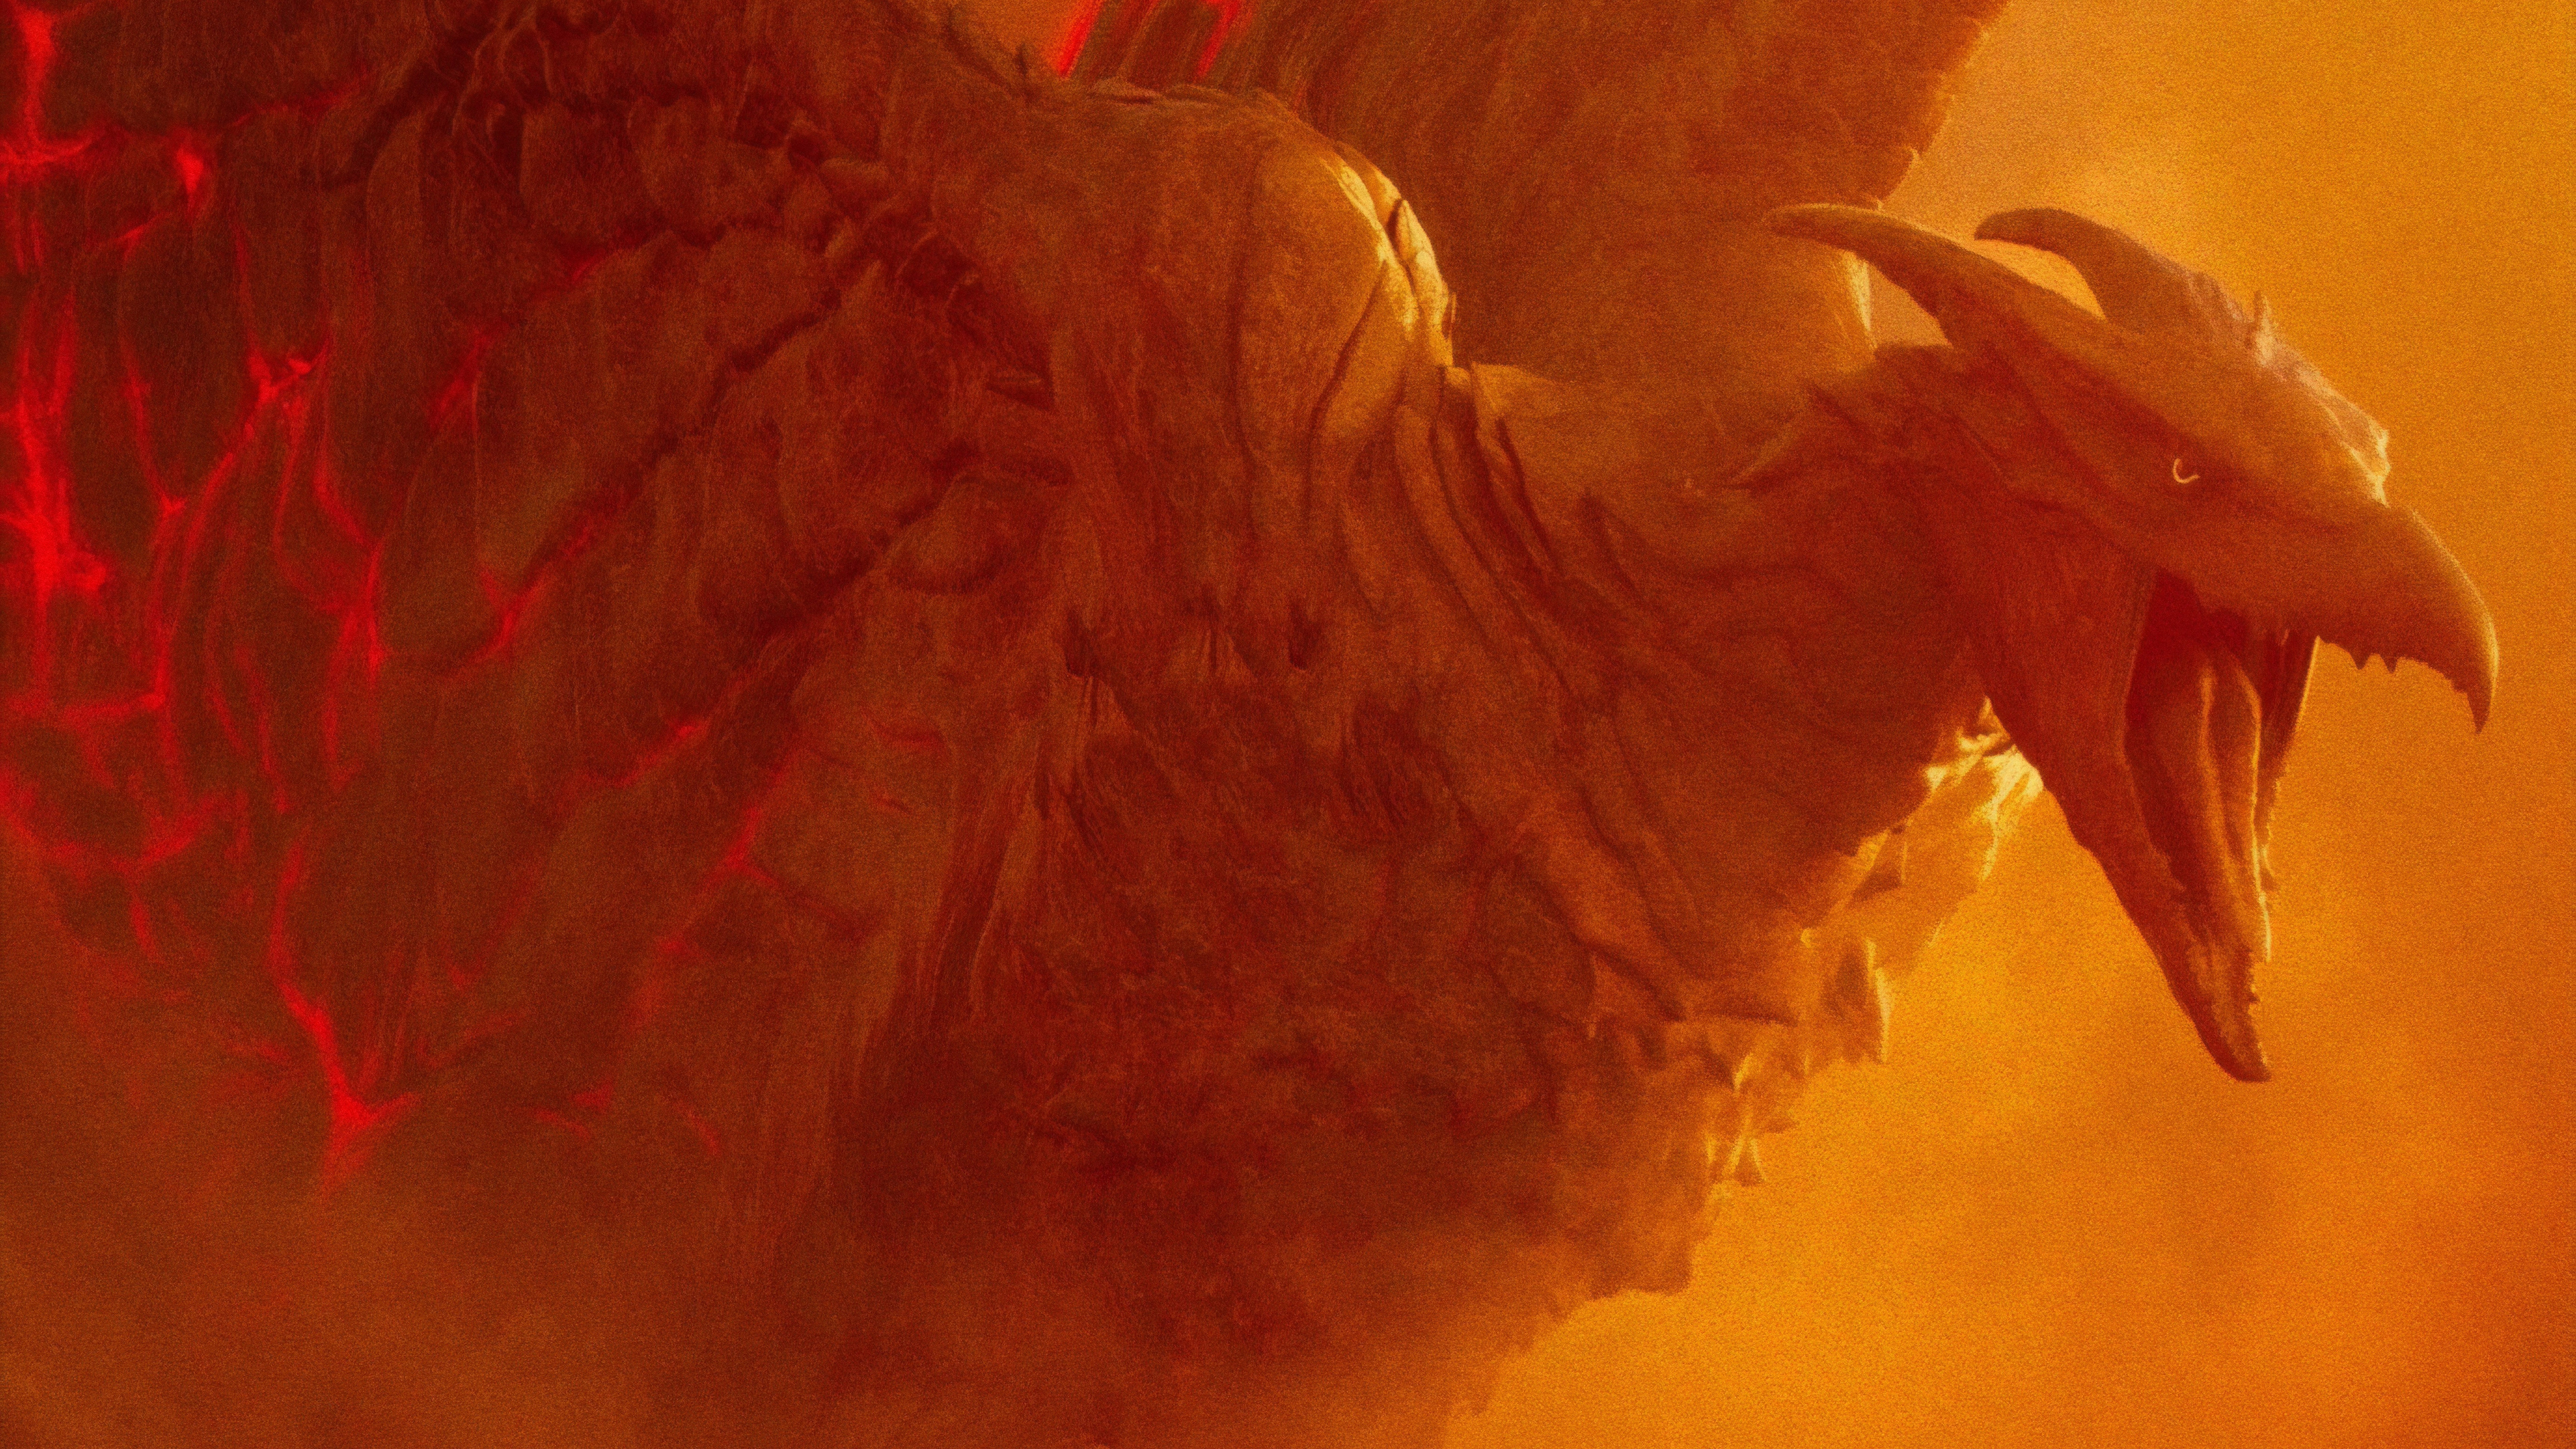 rodan godzilla king of the monsters 4k 1545589855 - Rodan Godzilla King Of The Monsters 4k - poster wallpapers, movies wallpapers, hd-wallpapers, godzilla king of the monsters wallpapers, 5k wallpapers, 4k-wallpapers, 2019 movies wallpapers